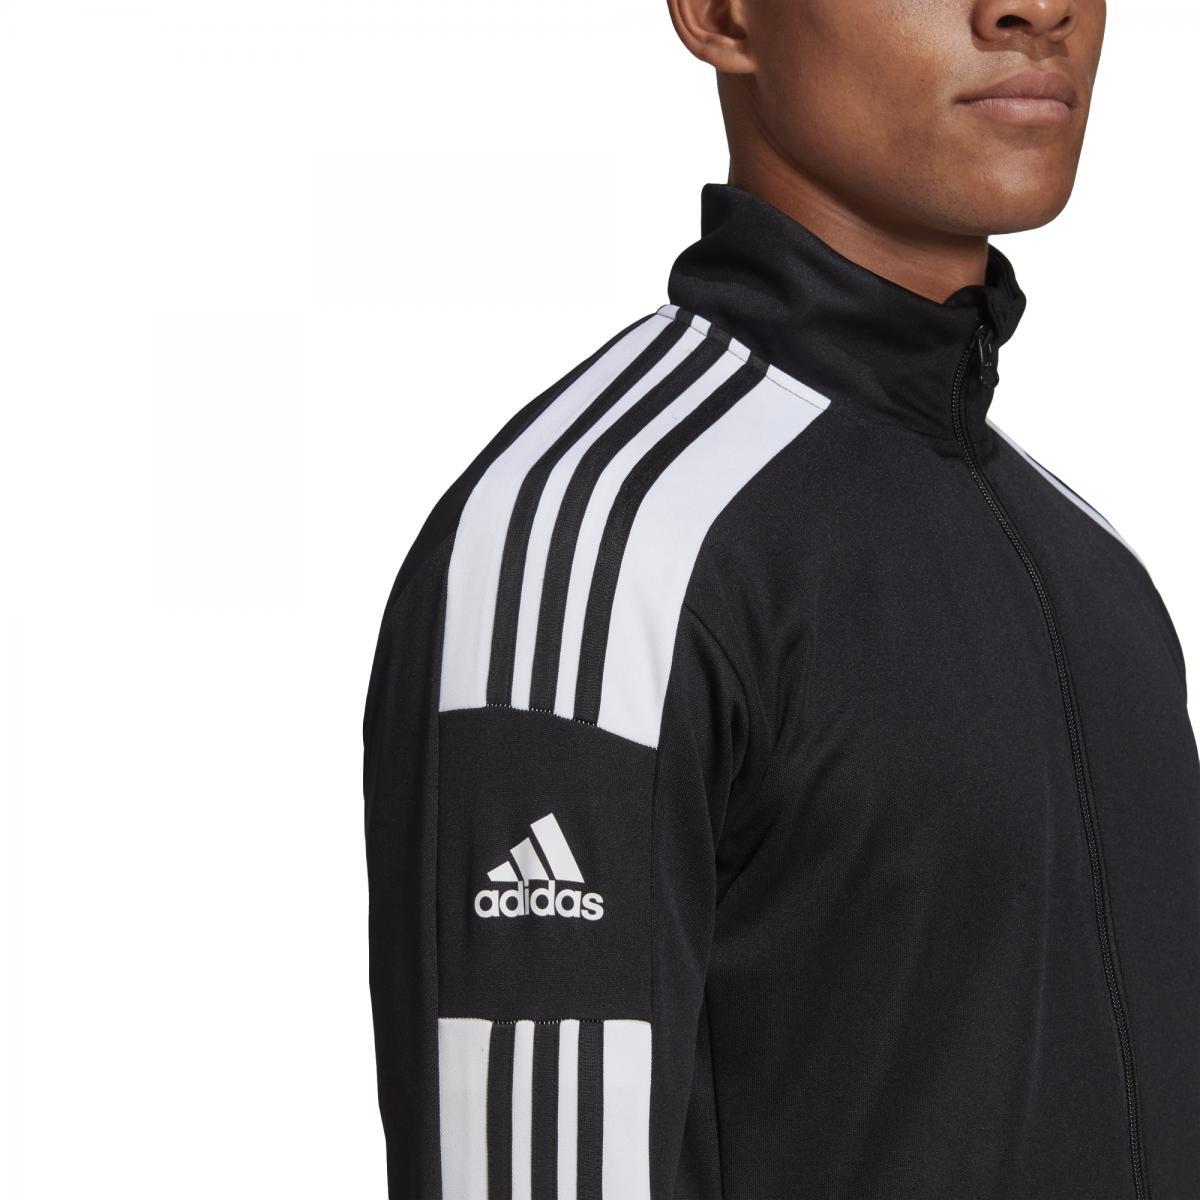 Adidas  Sq21 Tr Jkt(1)